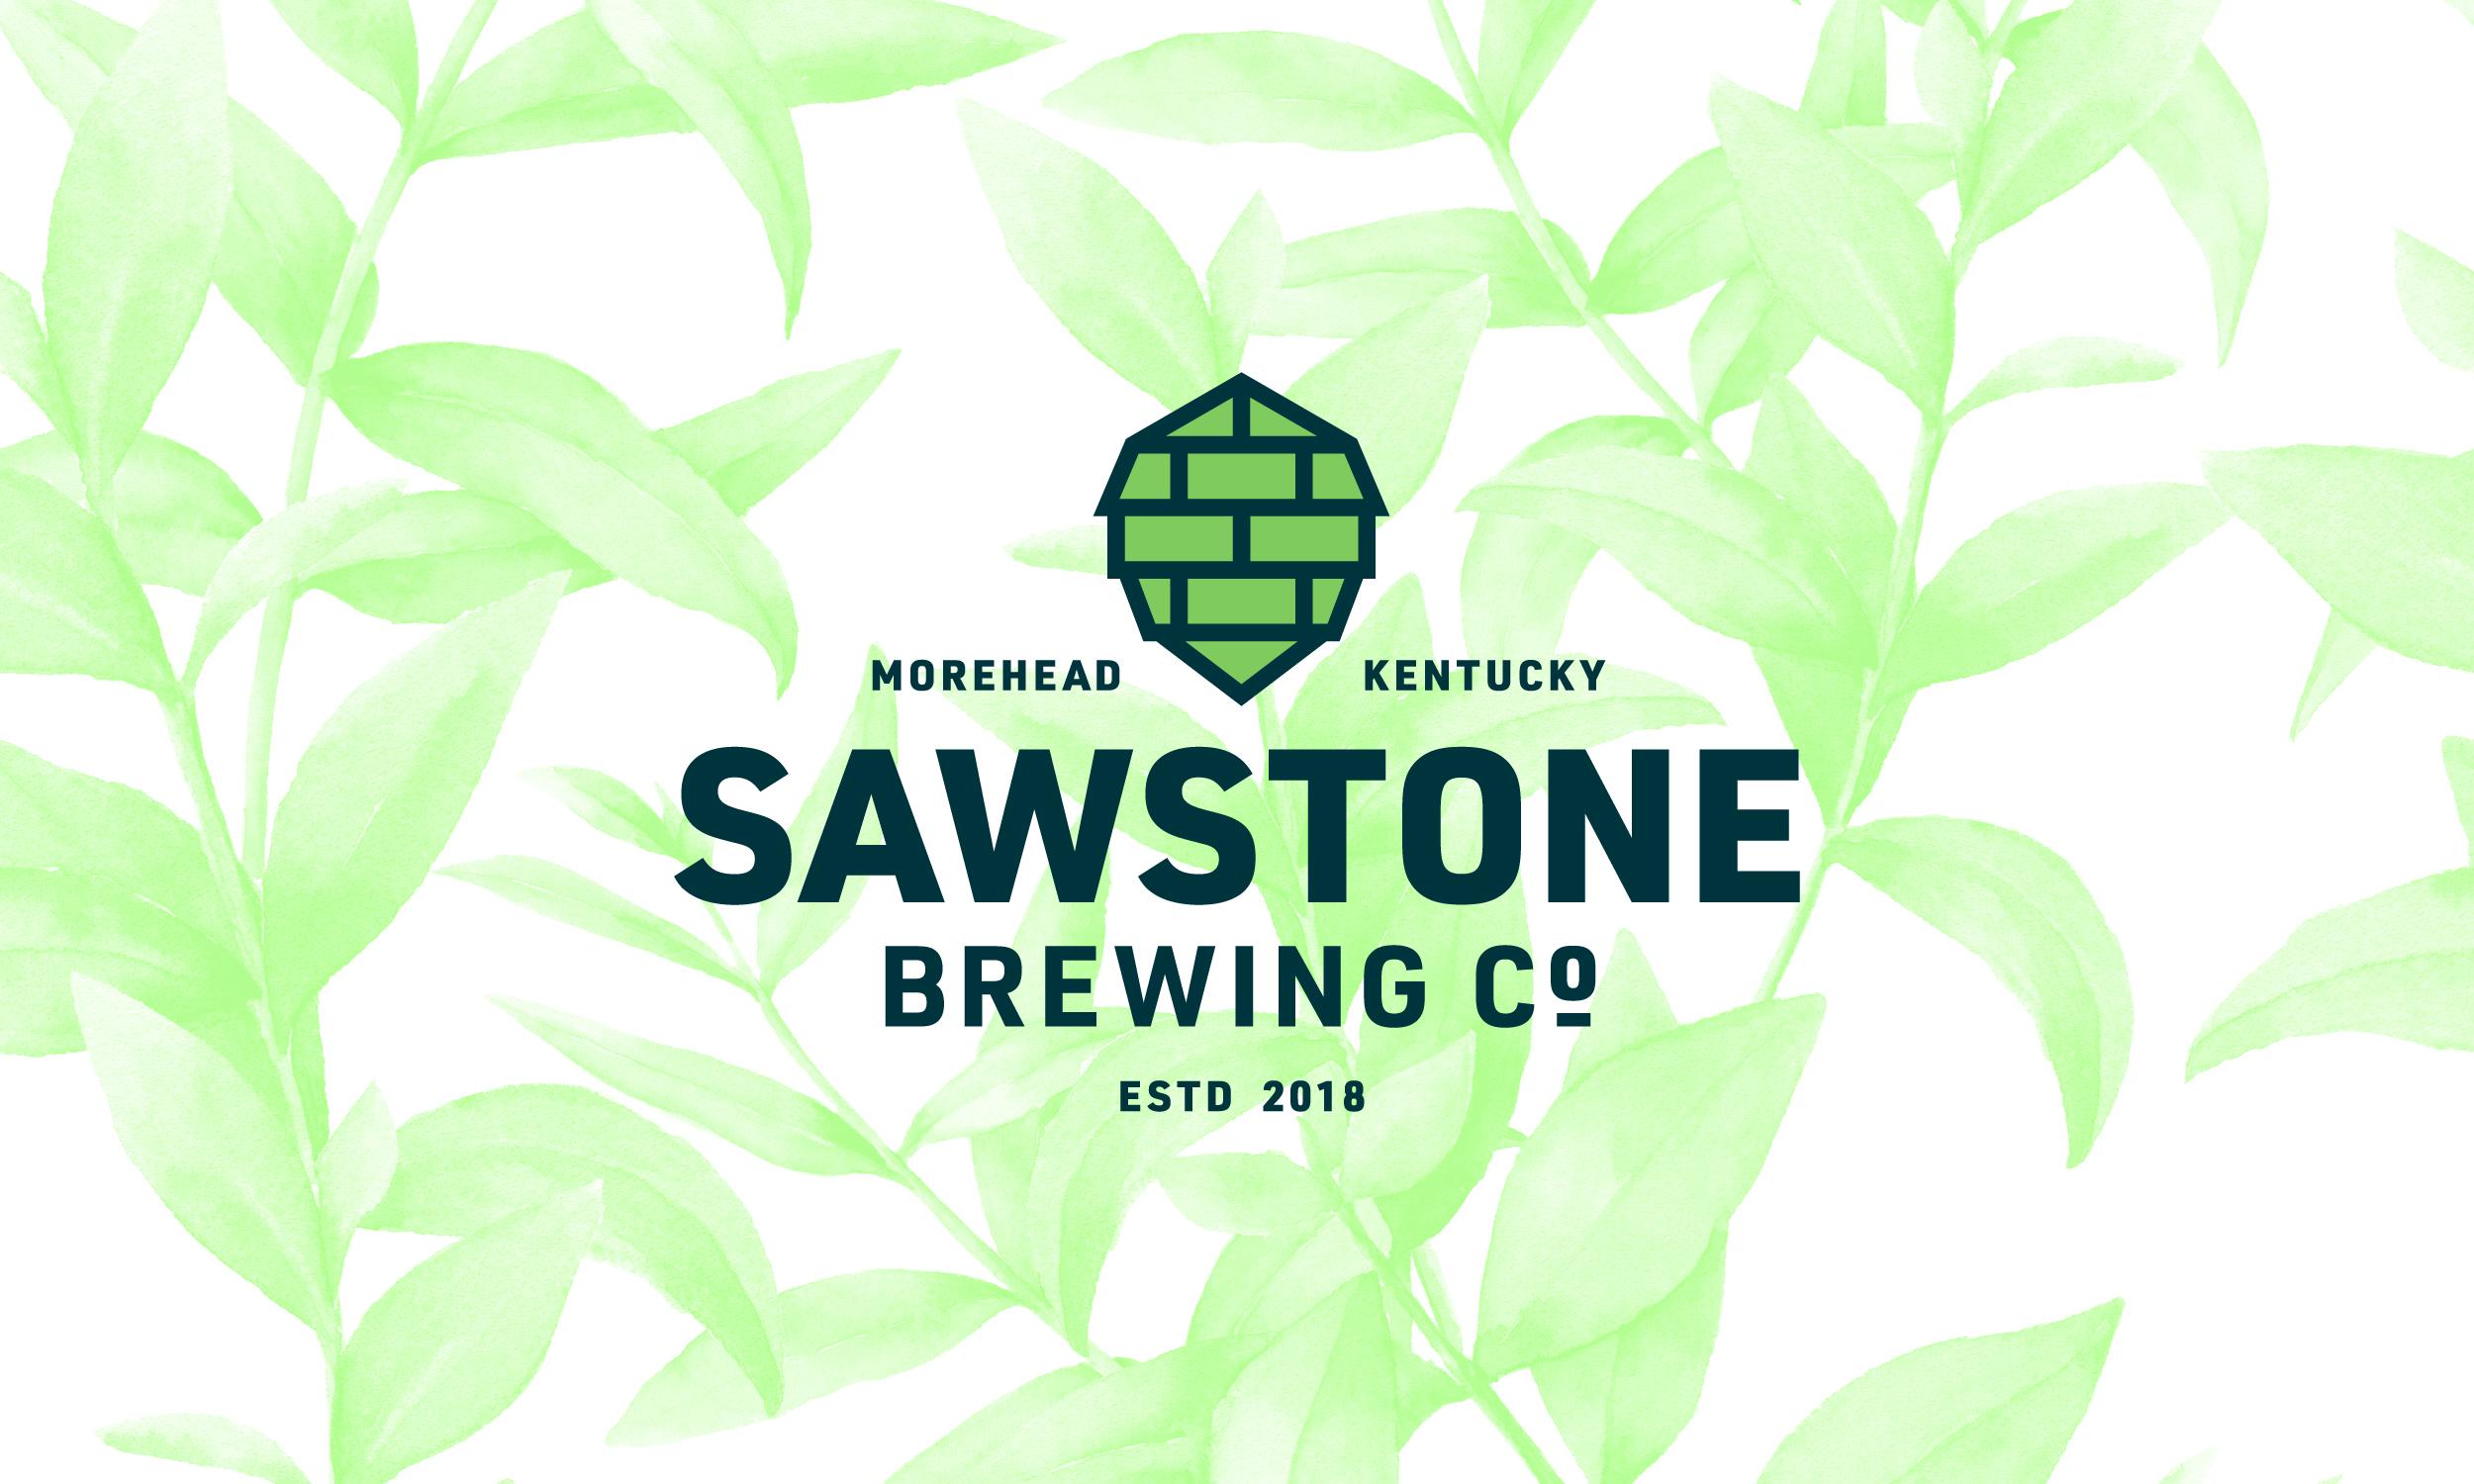 Sawstone Brewing Co.